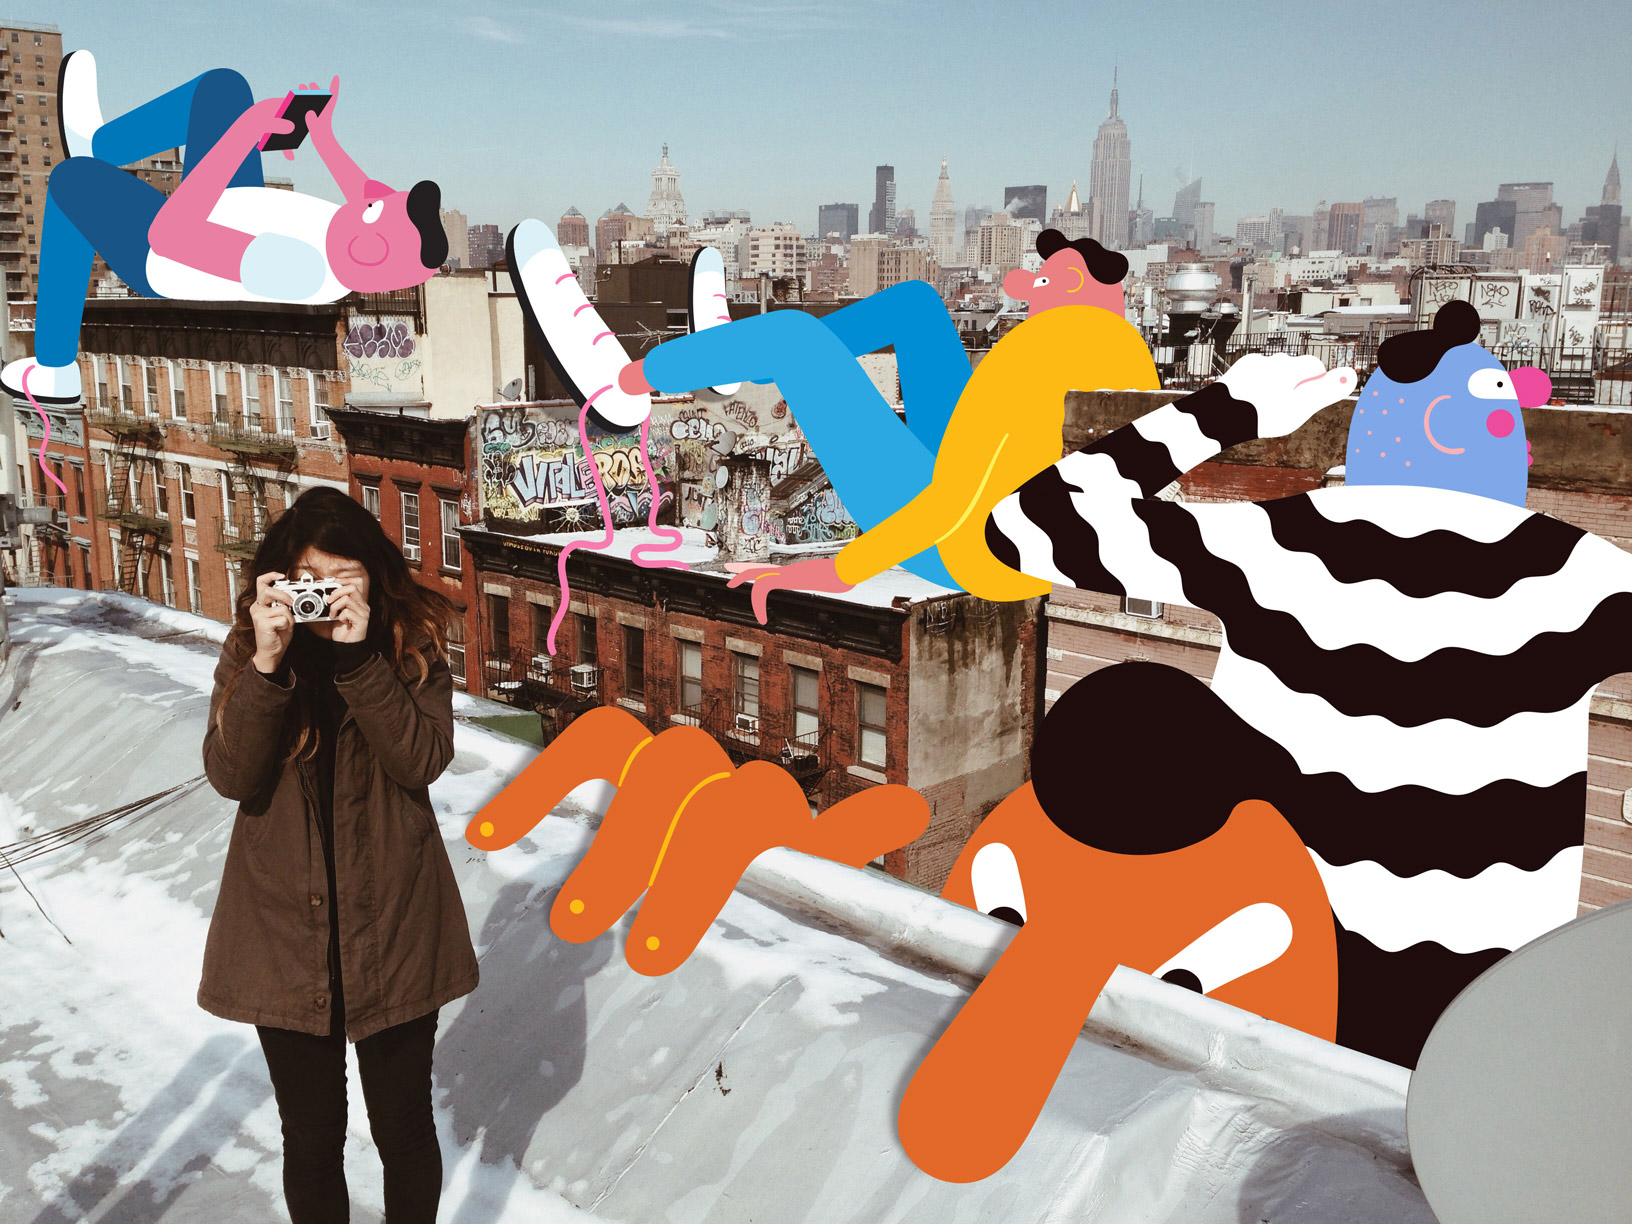 New-York-Alphabet-City-Roof-Travel-Illustration_LowestRes.jpg